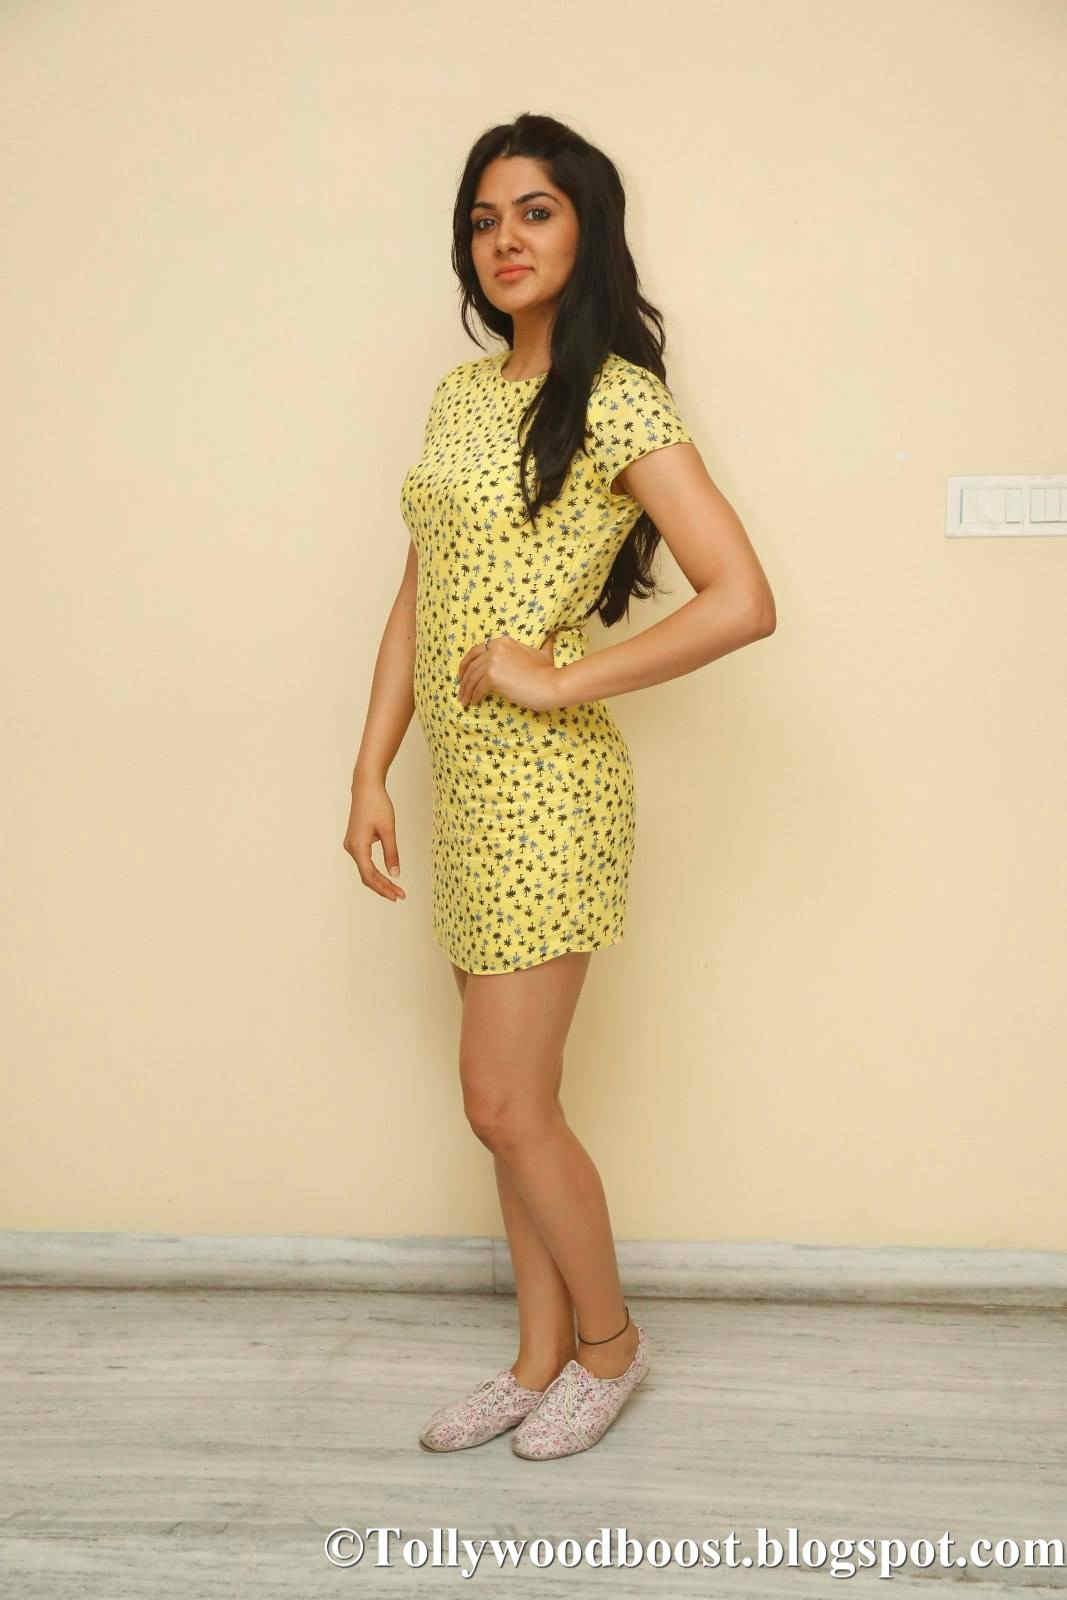 Actress Sakshi Chaudhary Long Legs Show In Yellow Mini Top